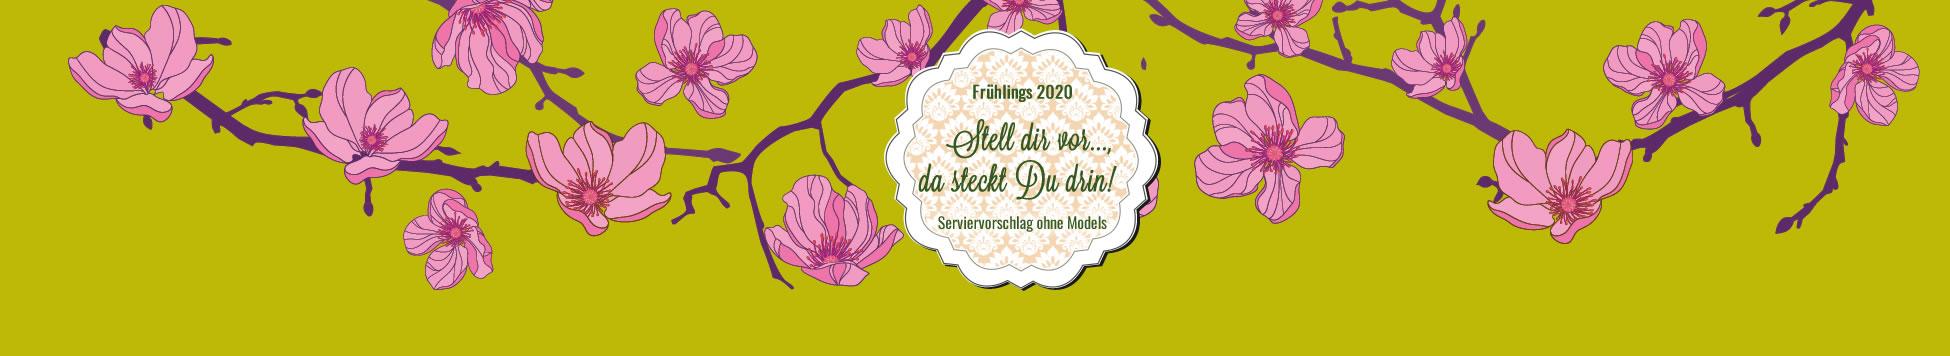 Schuhkollektion Frühling 2020